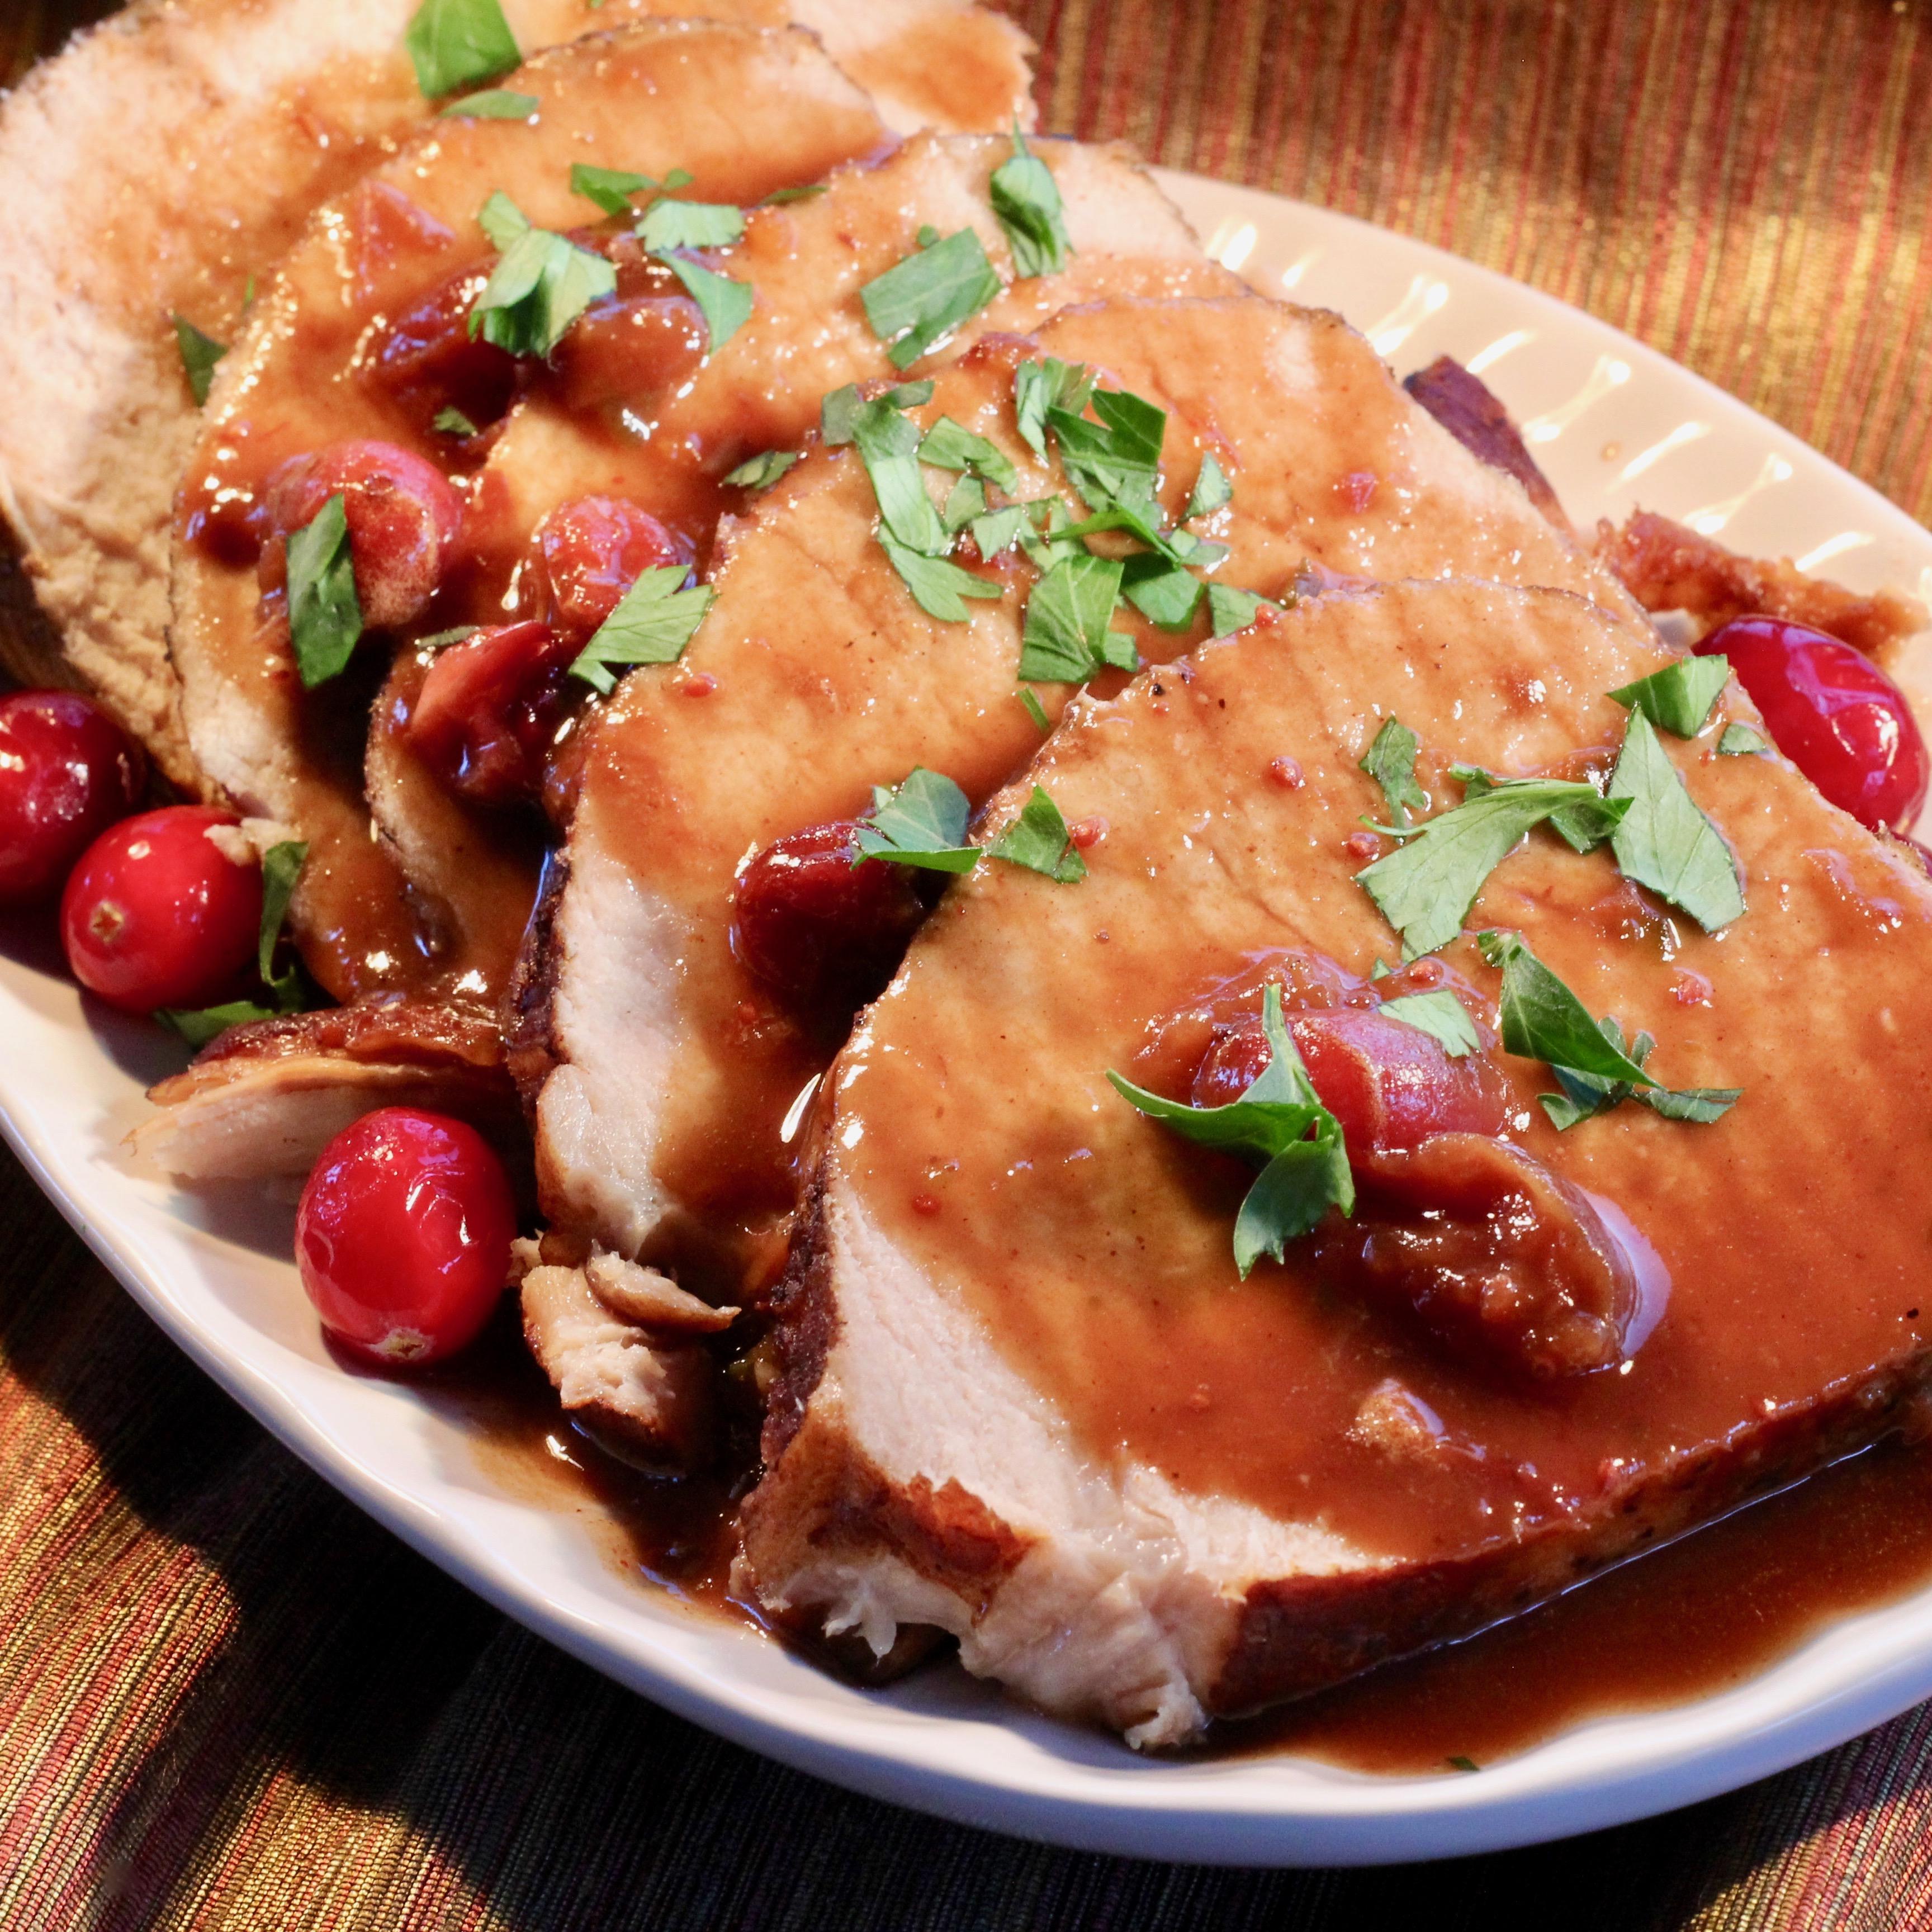 Instant Pot® Orange-Cranberry-Balsamic Pork Loin lutzflcat